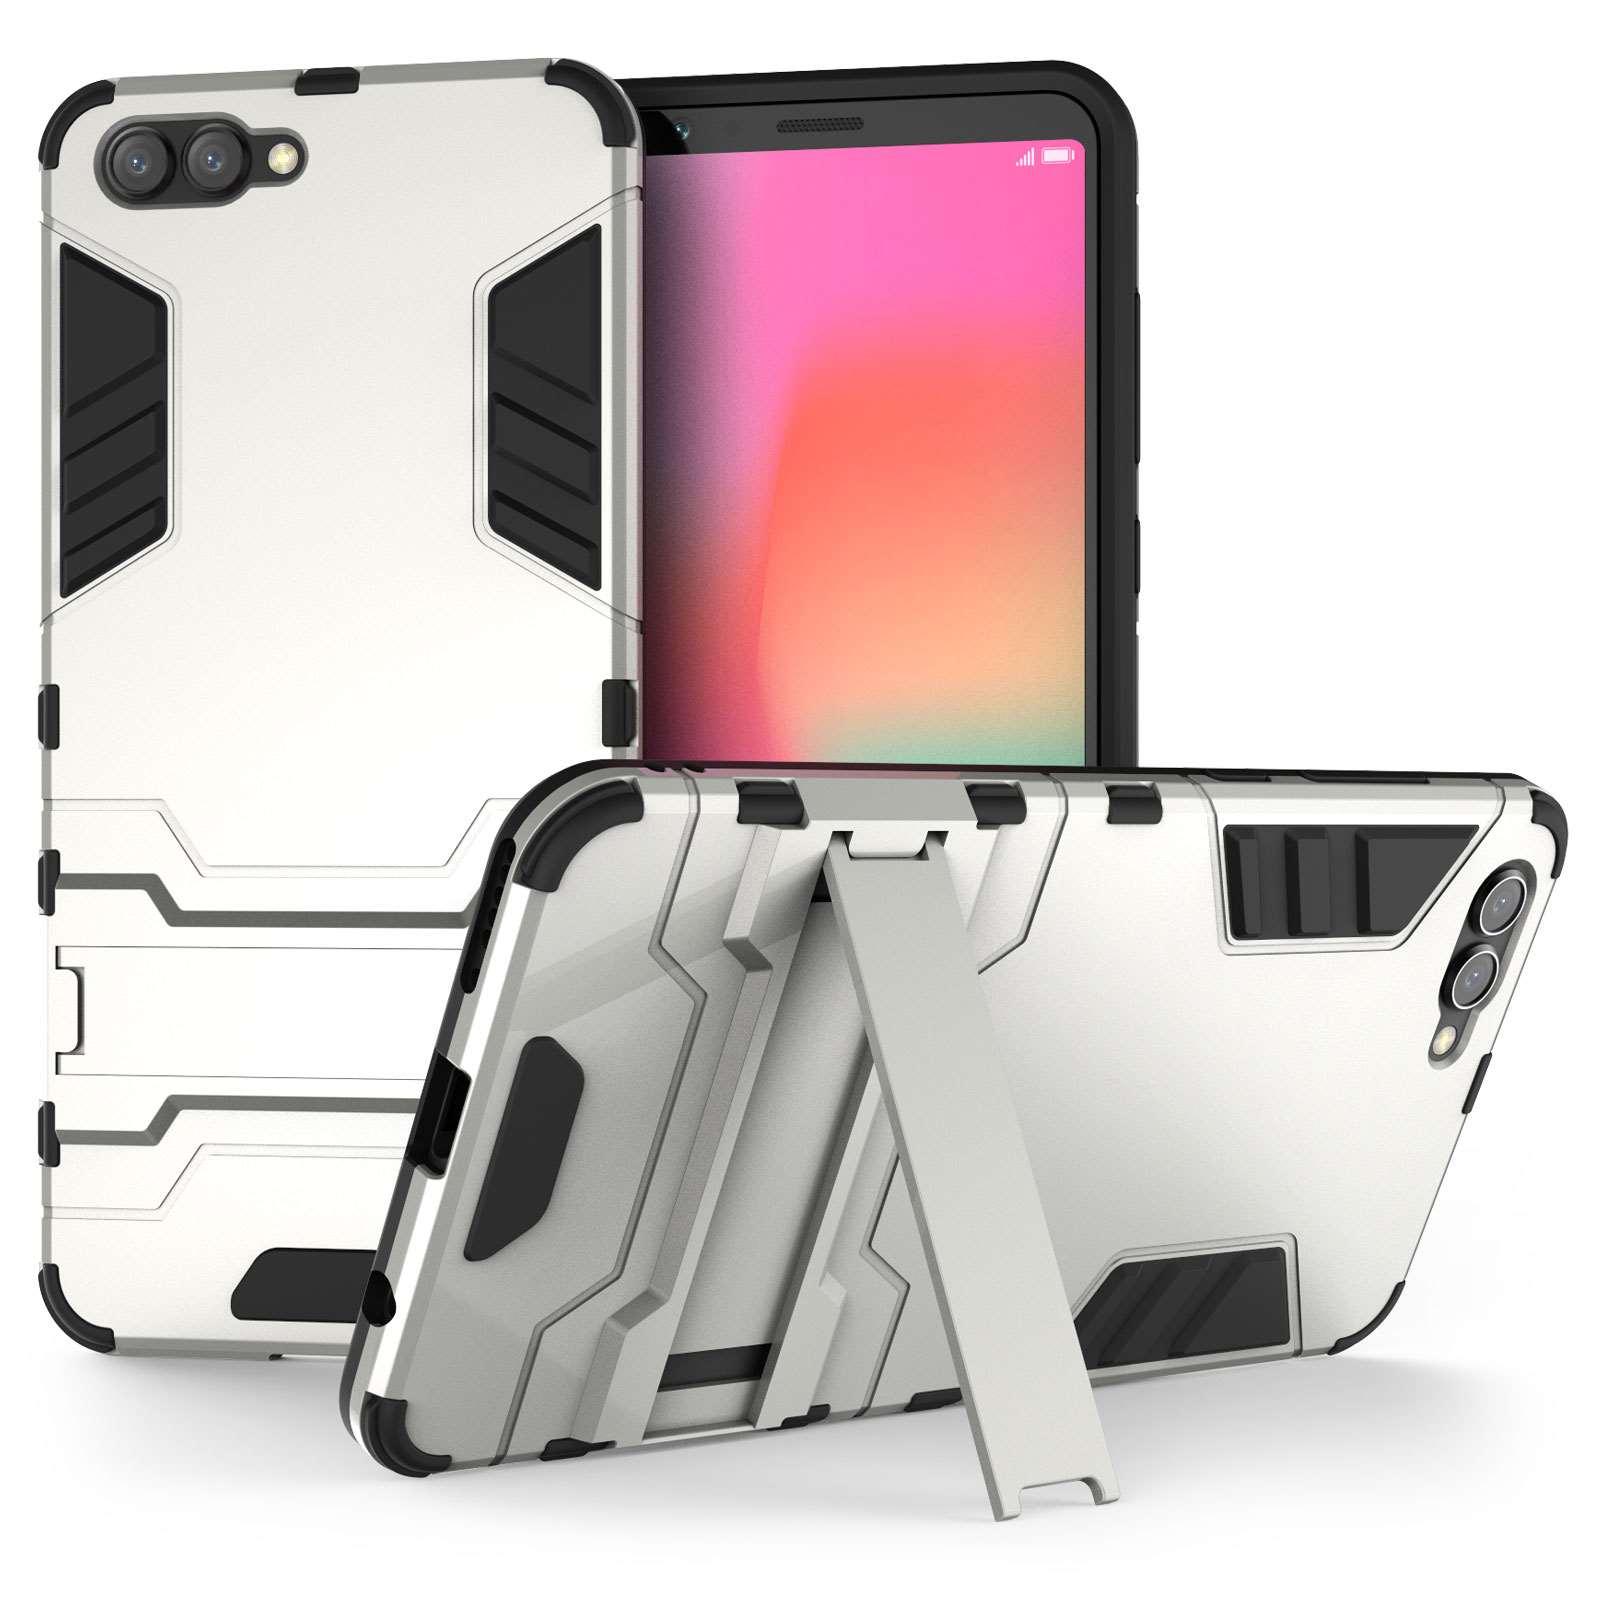 Caseflex Ανθεκτική Dual Layer Θήκη με Stand Honor View 10 - Steel Silver & Screen Protector (HU-AW03-Z508)